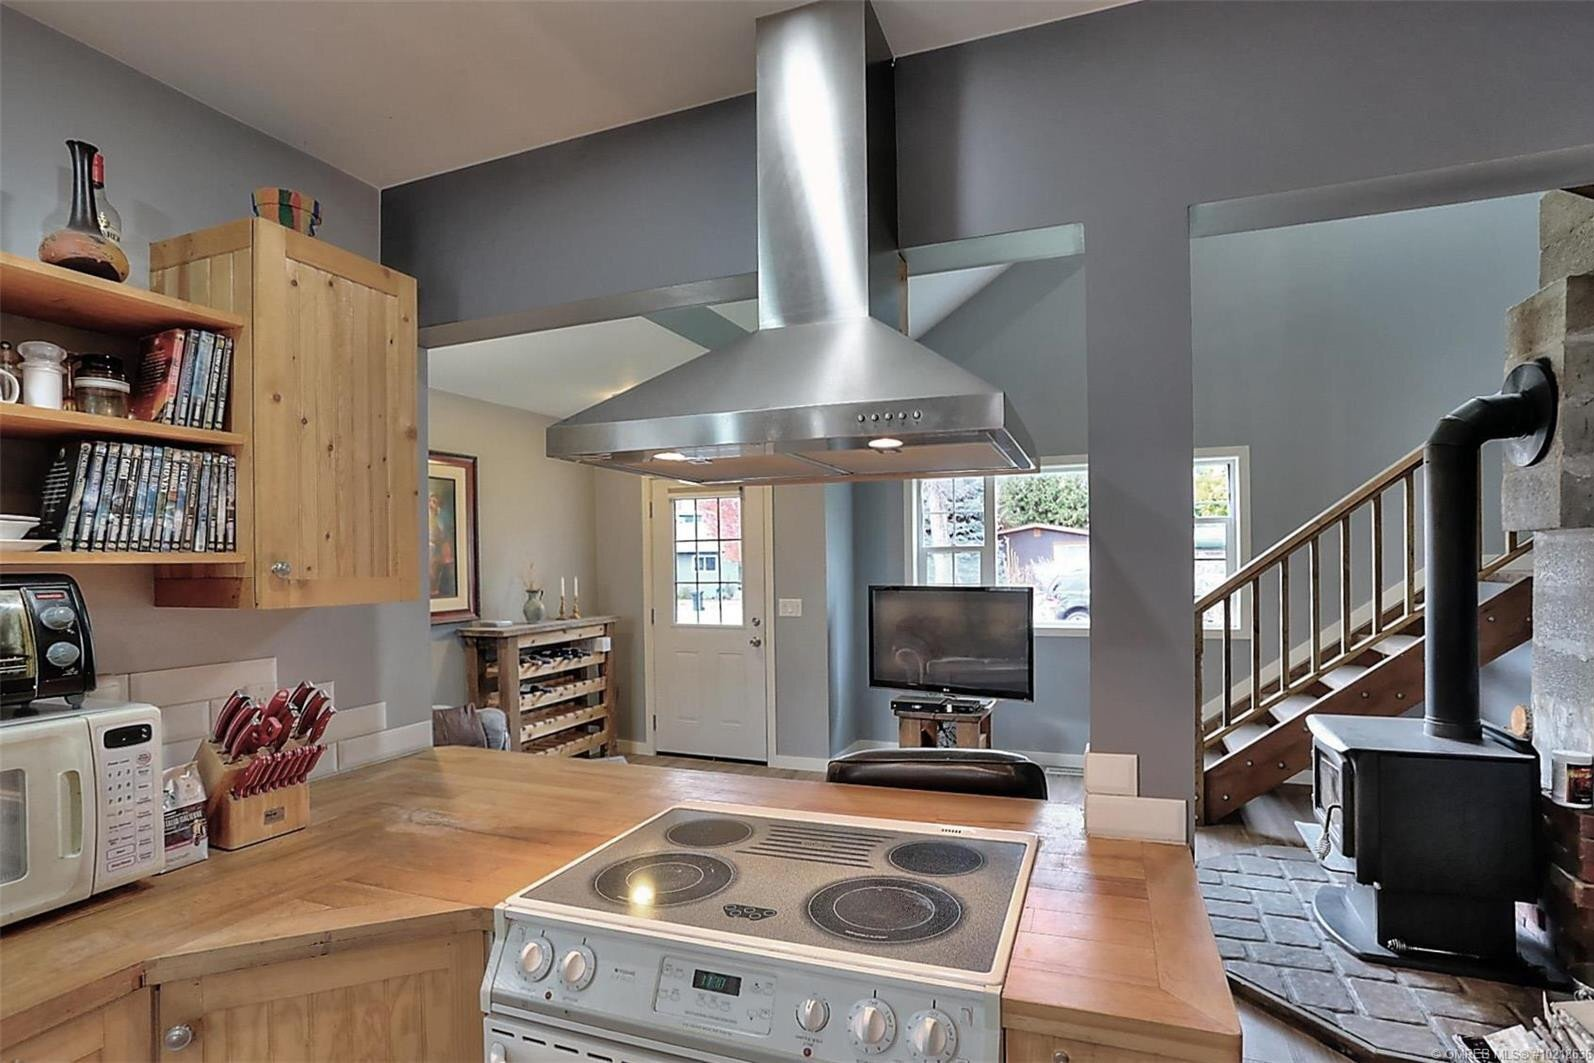 House for sale at 1441 Mcinnes Ave Kelowna British Columbia - MLS: 10218636